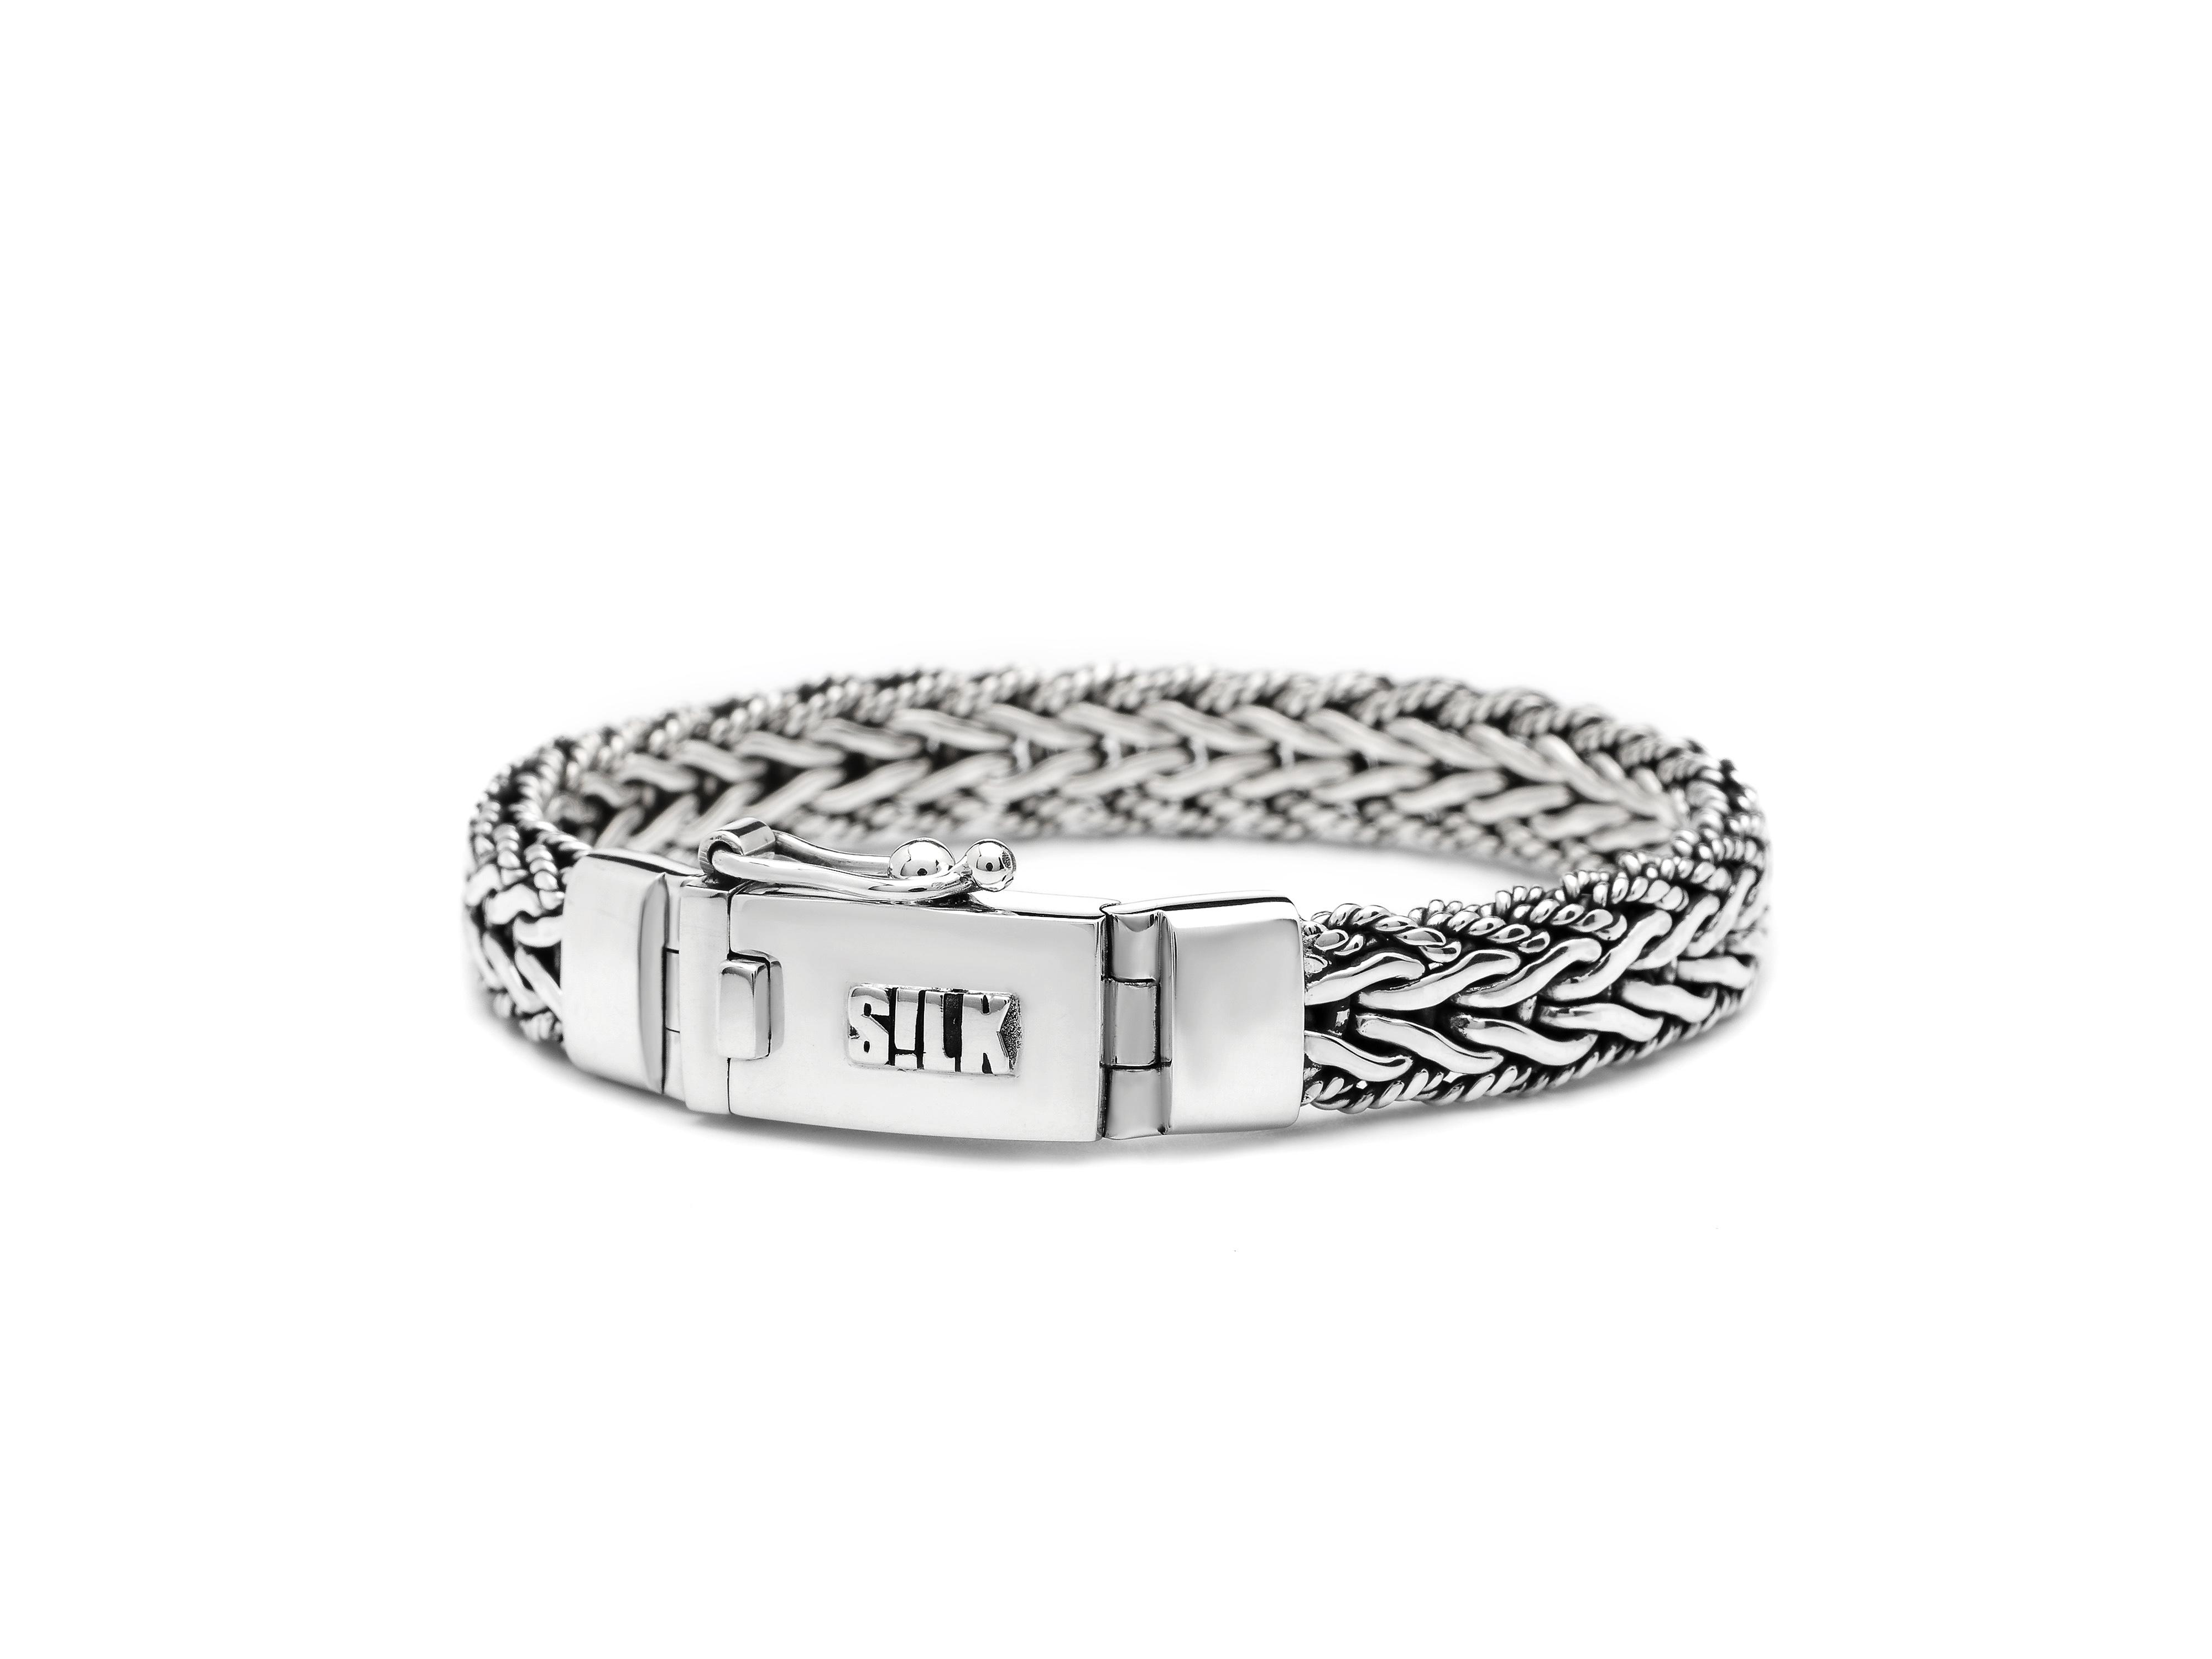 SILK Jewellery Armband zilver 'Ganesha' 19 cm 237